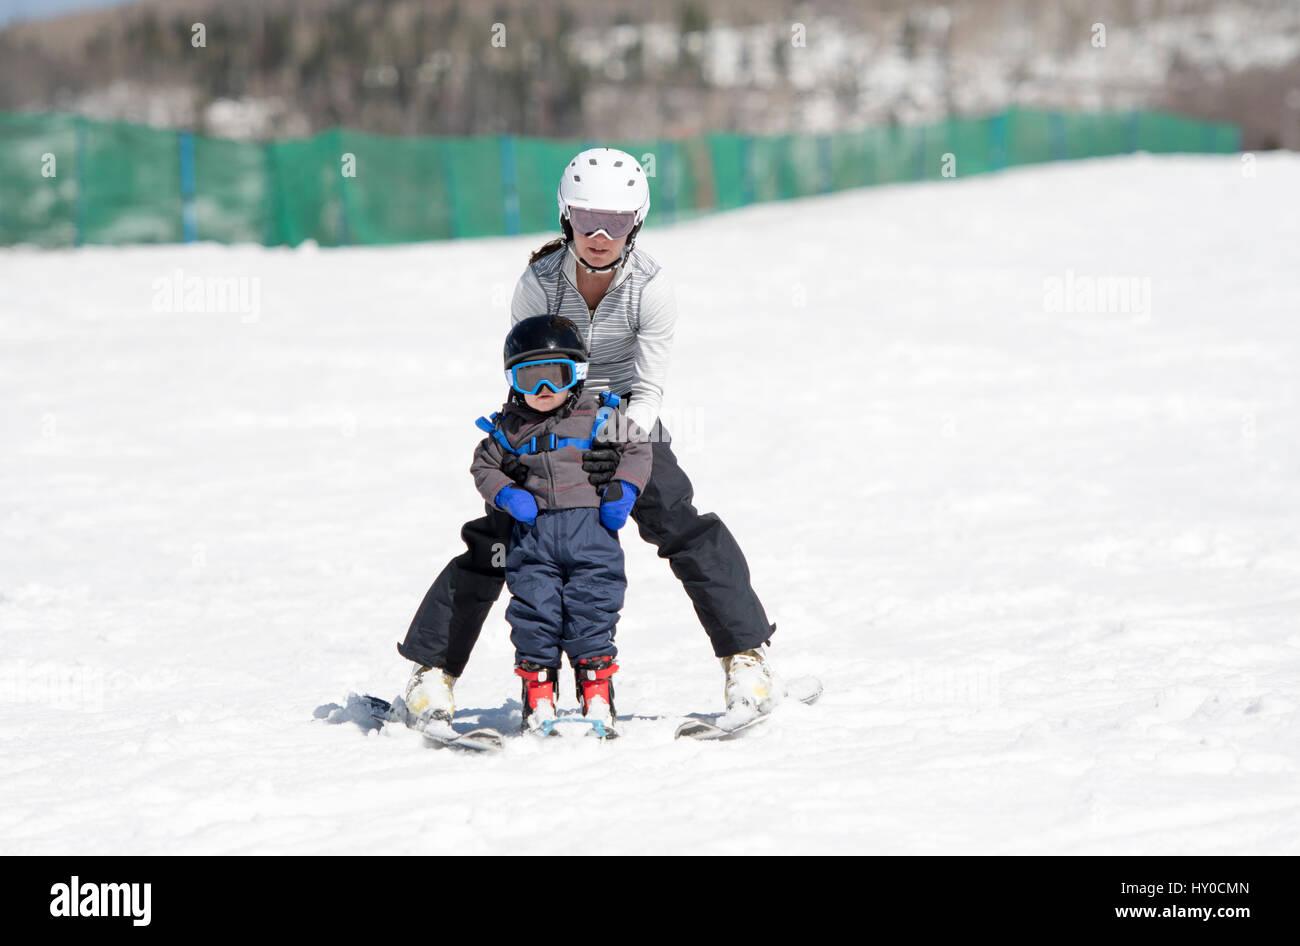 252f1698fdfe Boy Dressed In Ski Clothing Stock Photos   Boy Dressed In Ski ...